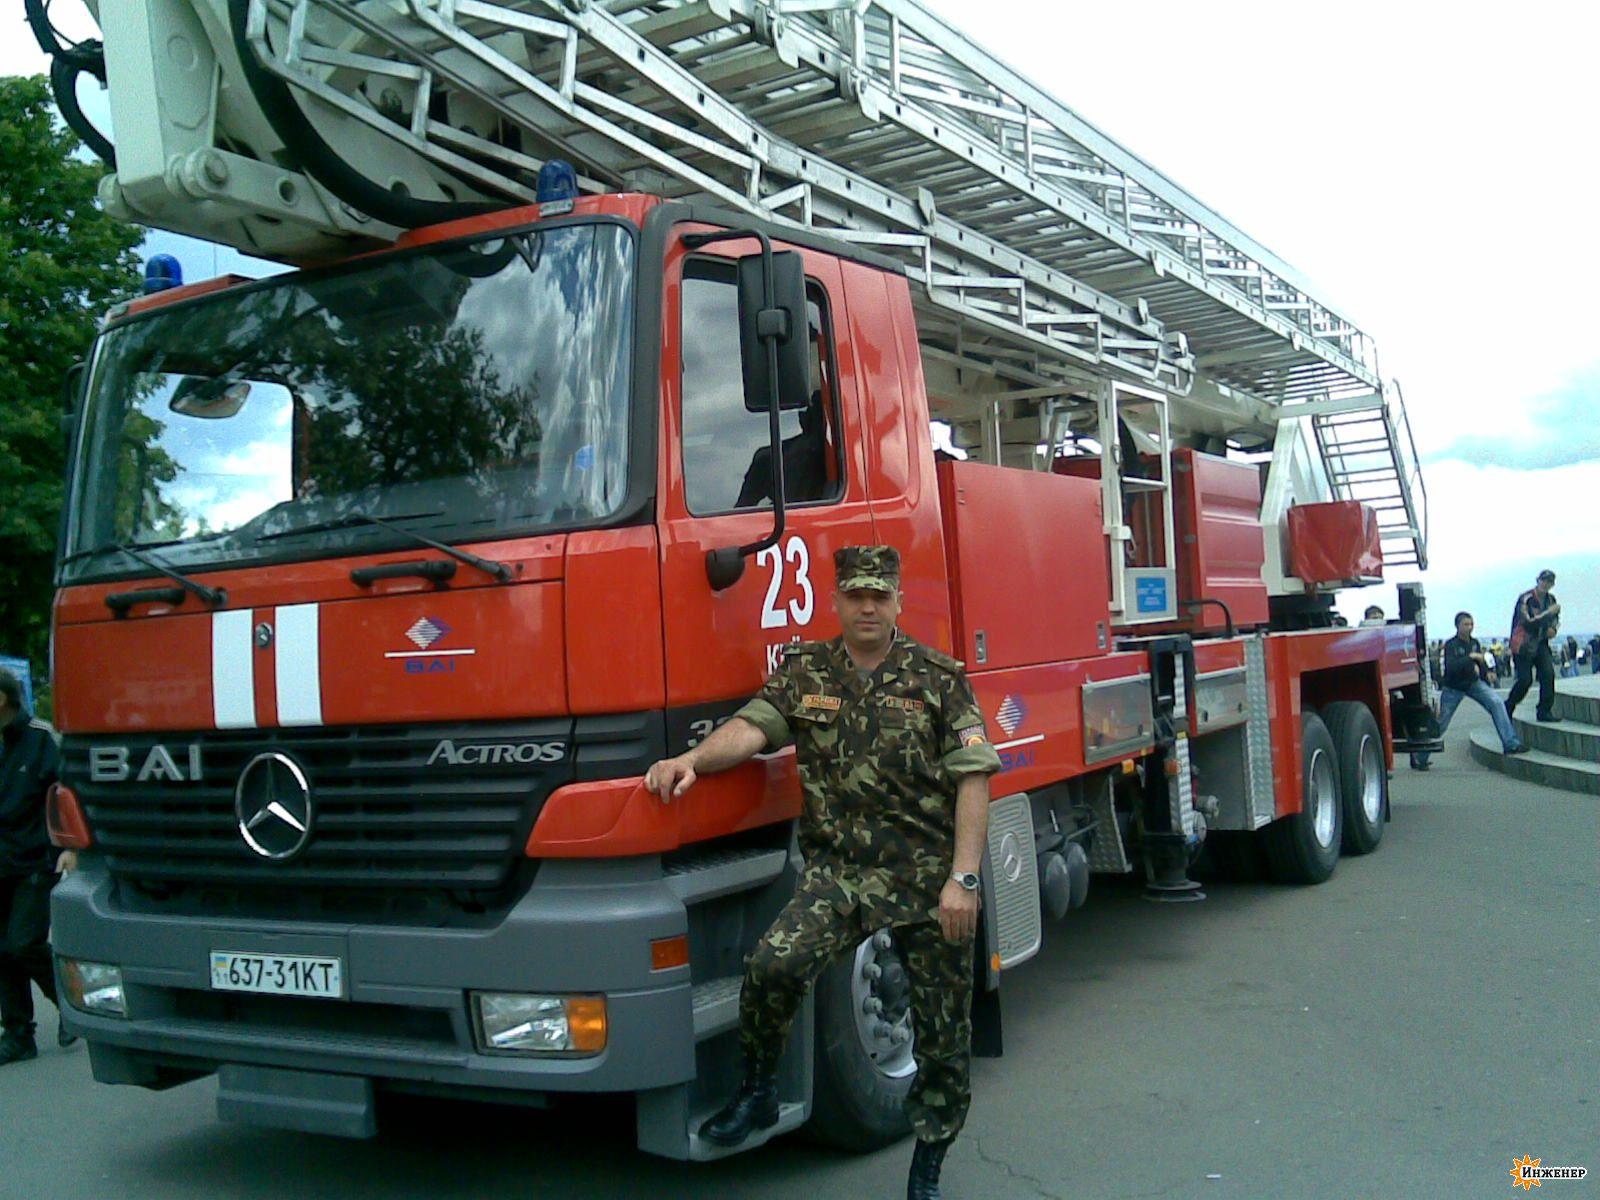 Пожарная машина(268.68 Kb)